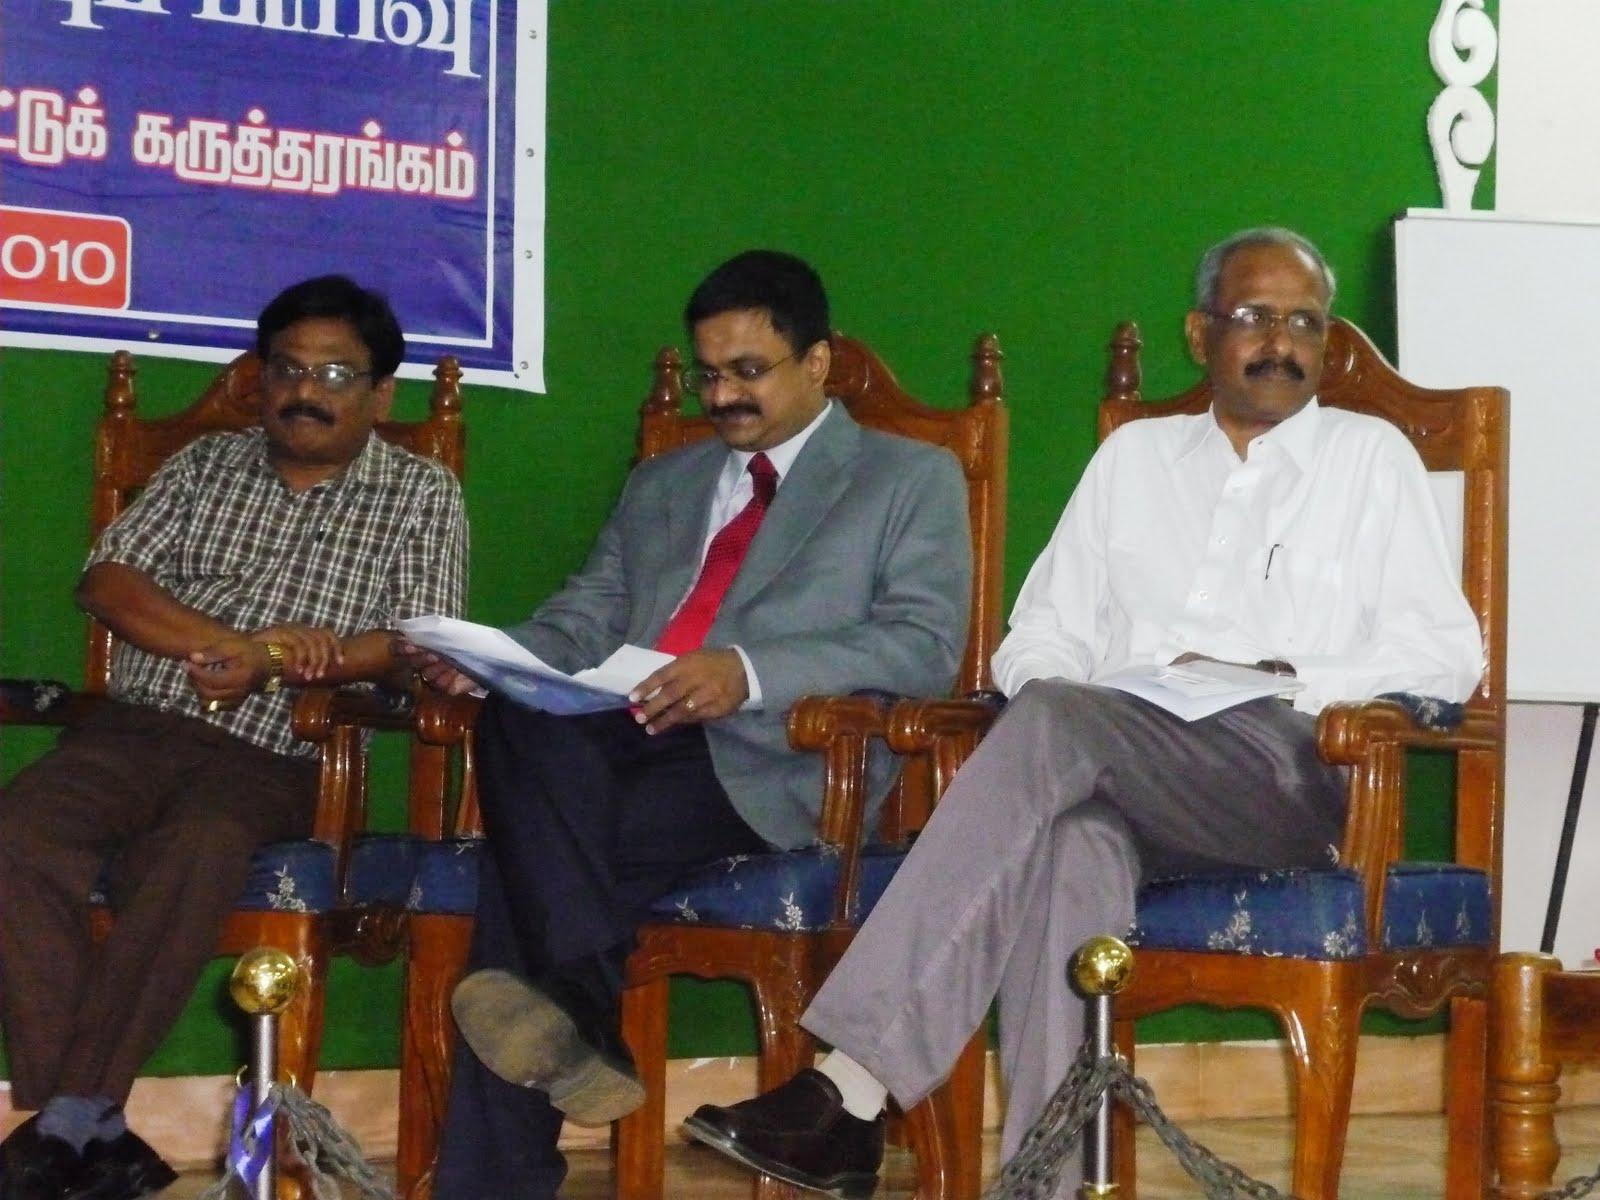 Dr.Ganesan (Annamalai University), T.N.C.Venkata Rangan (Chair, INFITT), A.Elangovan (CEO, CADGRAF)